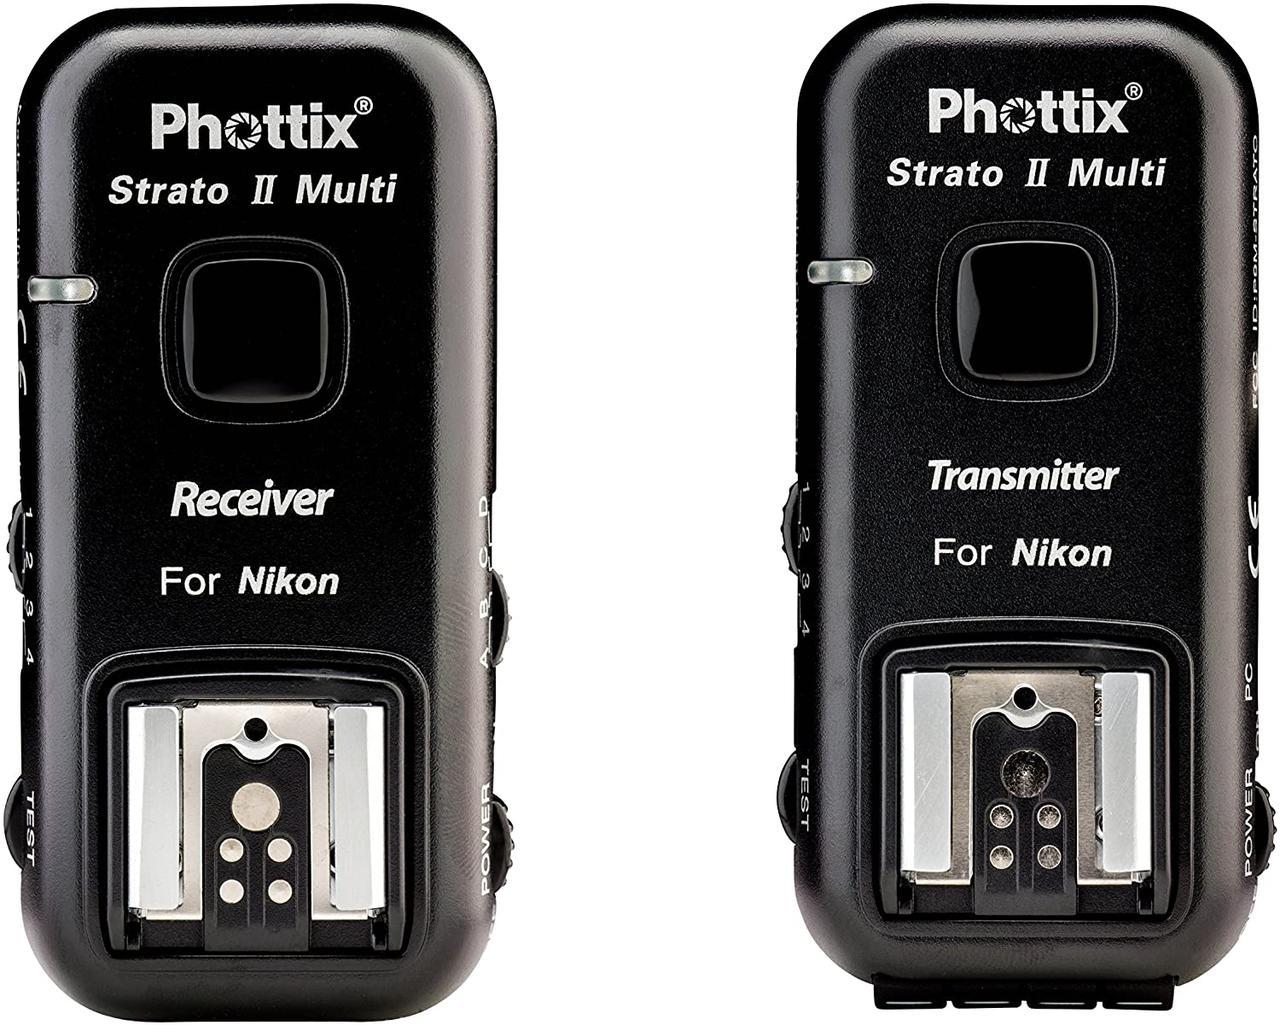 phottix strato ii flash trigger.jpg